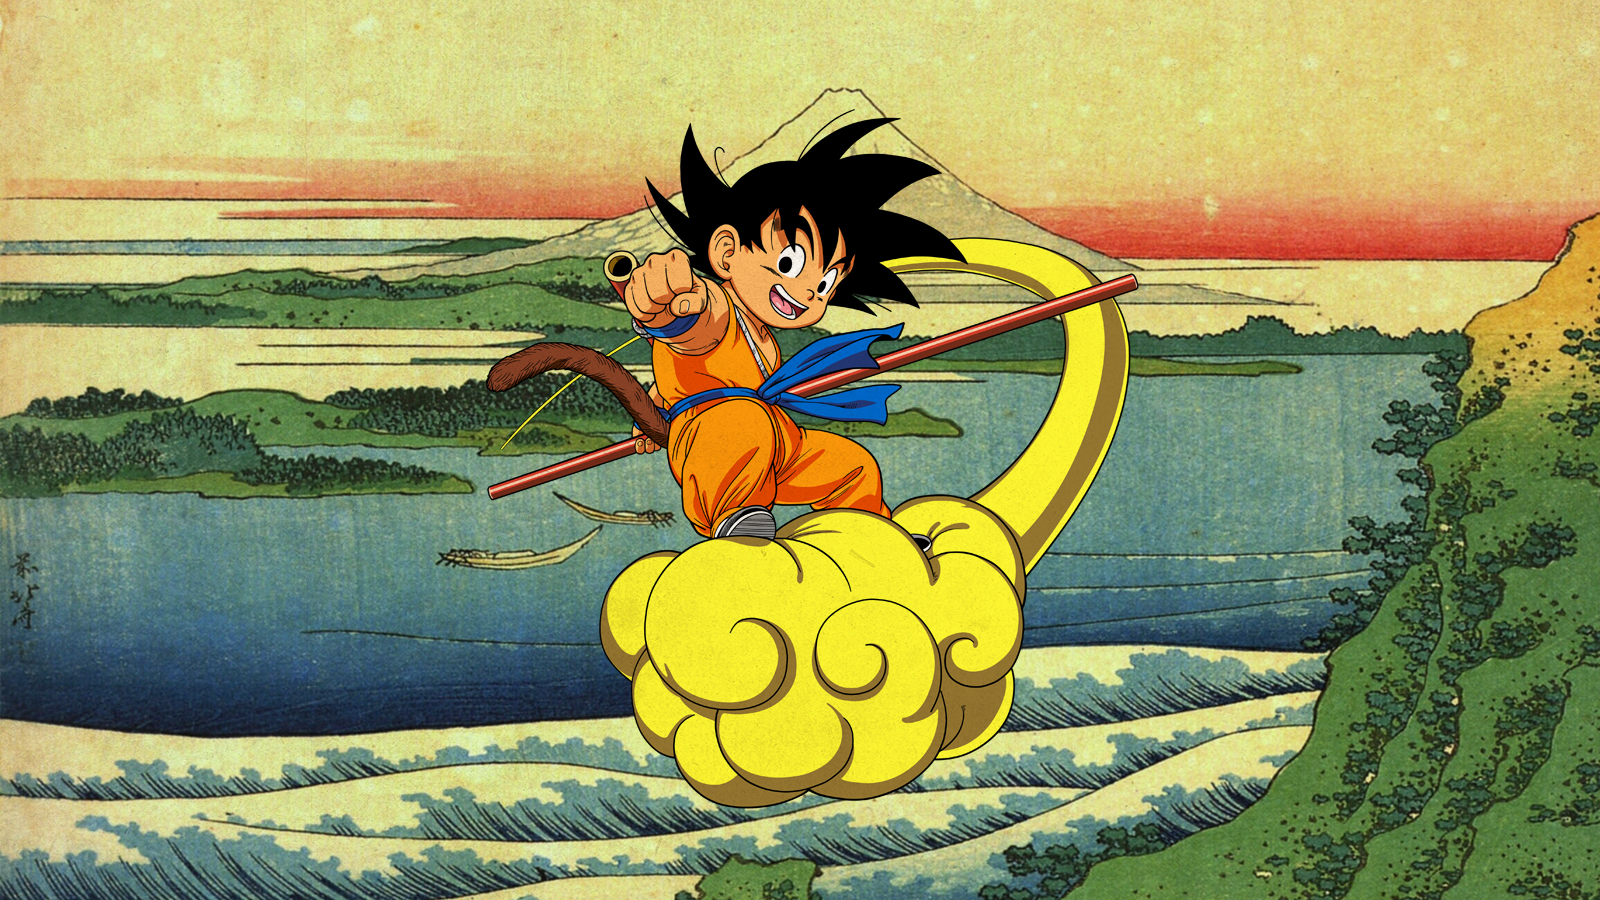 Kid Goku Dragonball Wallpaper By Franky4fingersx2 On Deviantart